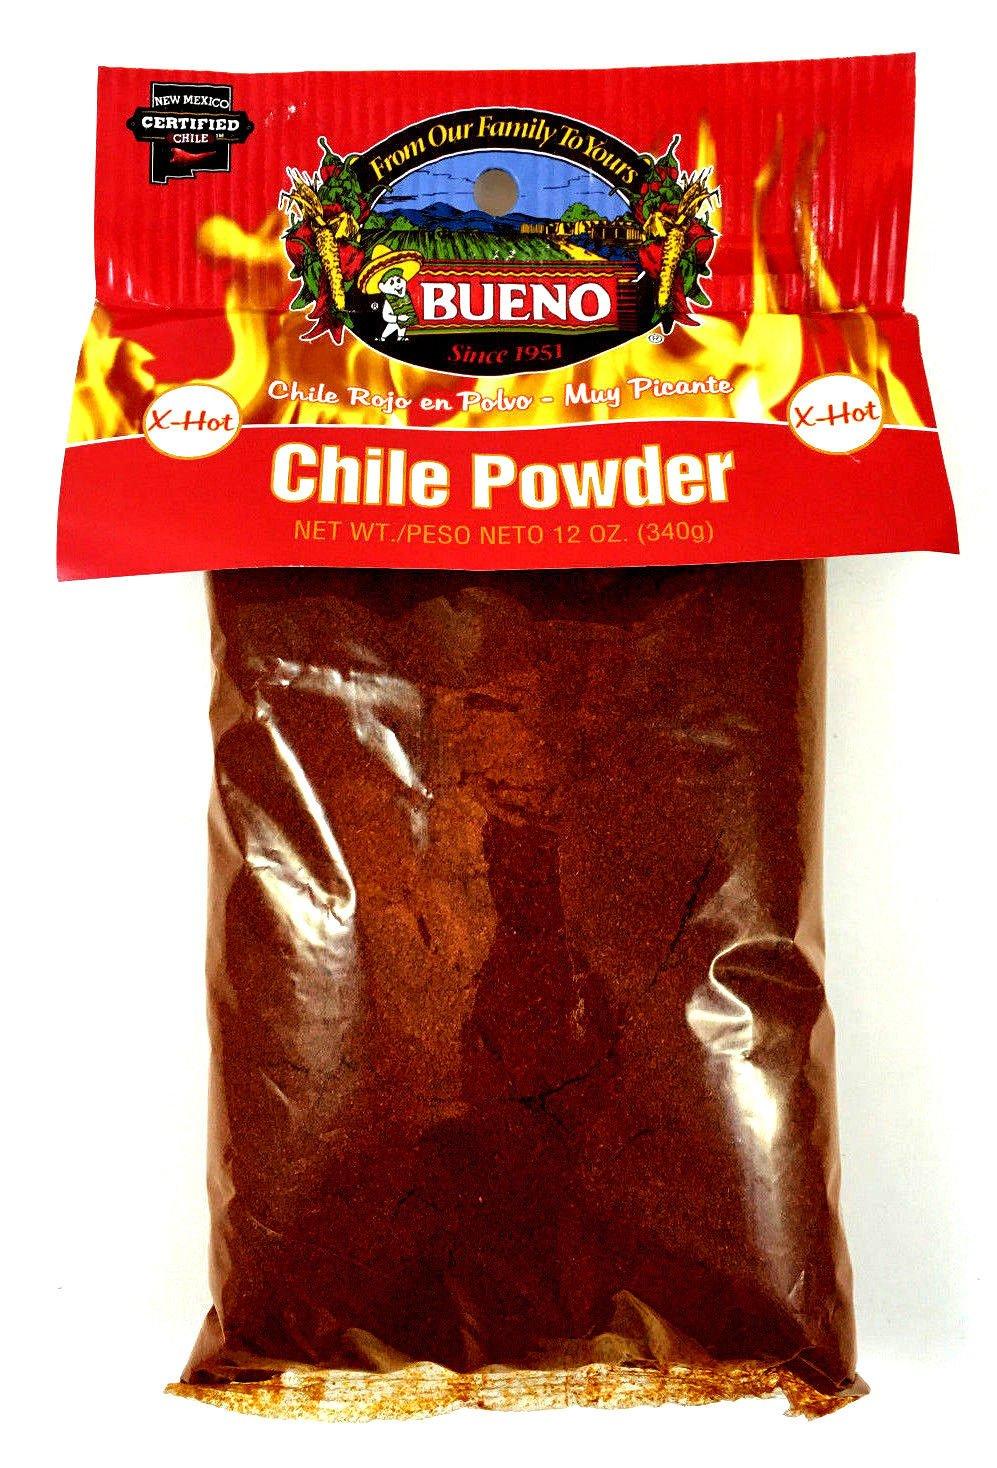 Bueno Red Chile Powder, X-HOT, 12oz. Bag